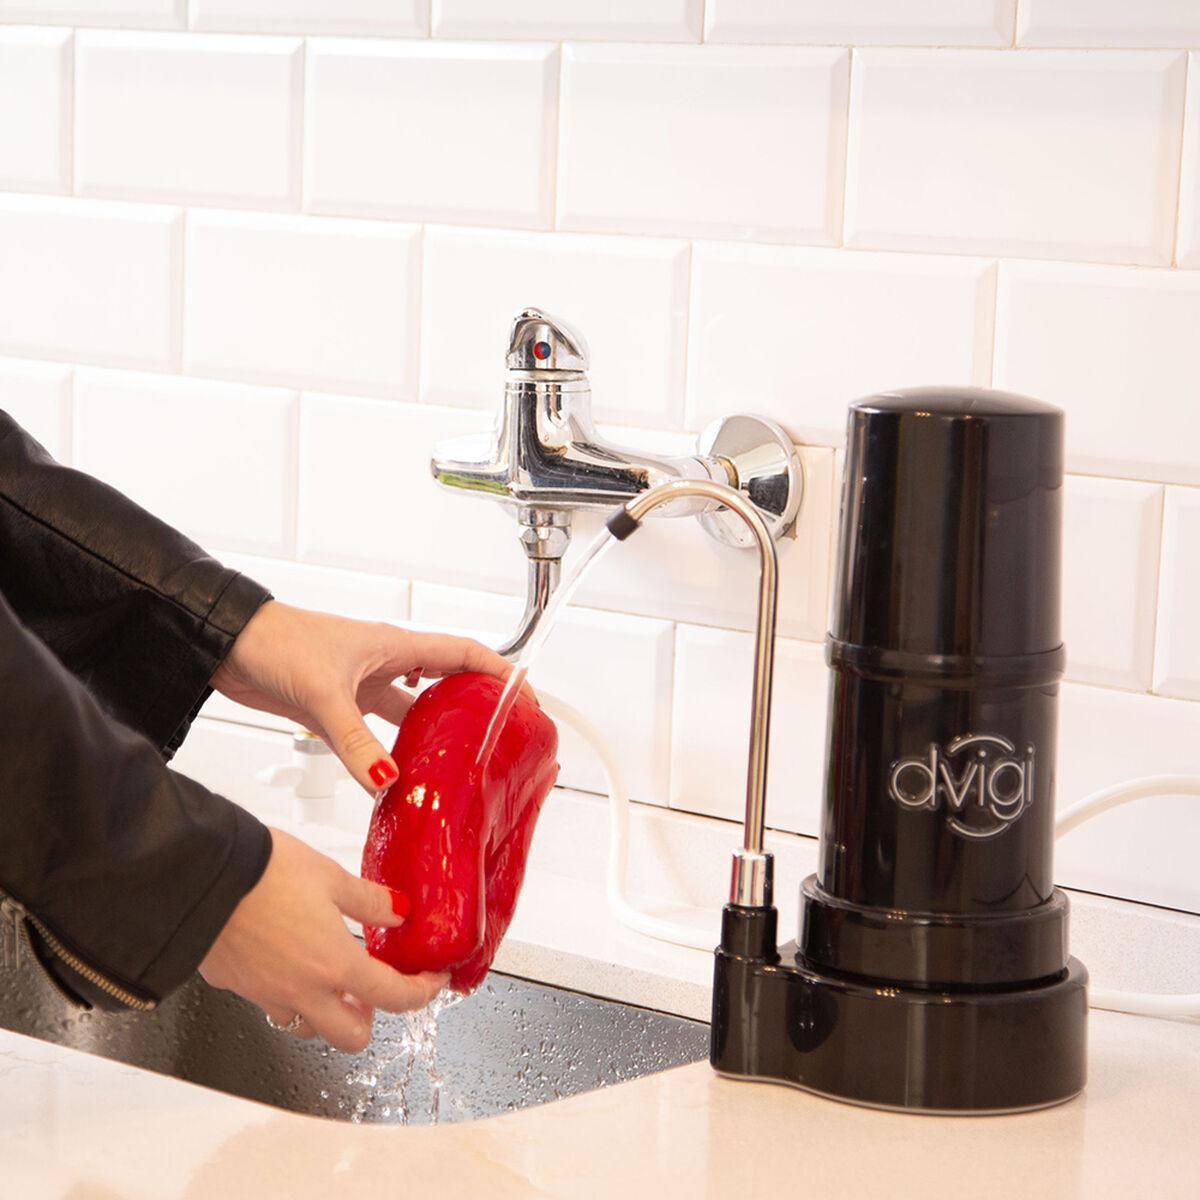 Purificador de Agua Dvigi Filtro Sobre Cubierta Negro